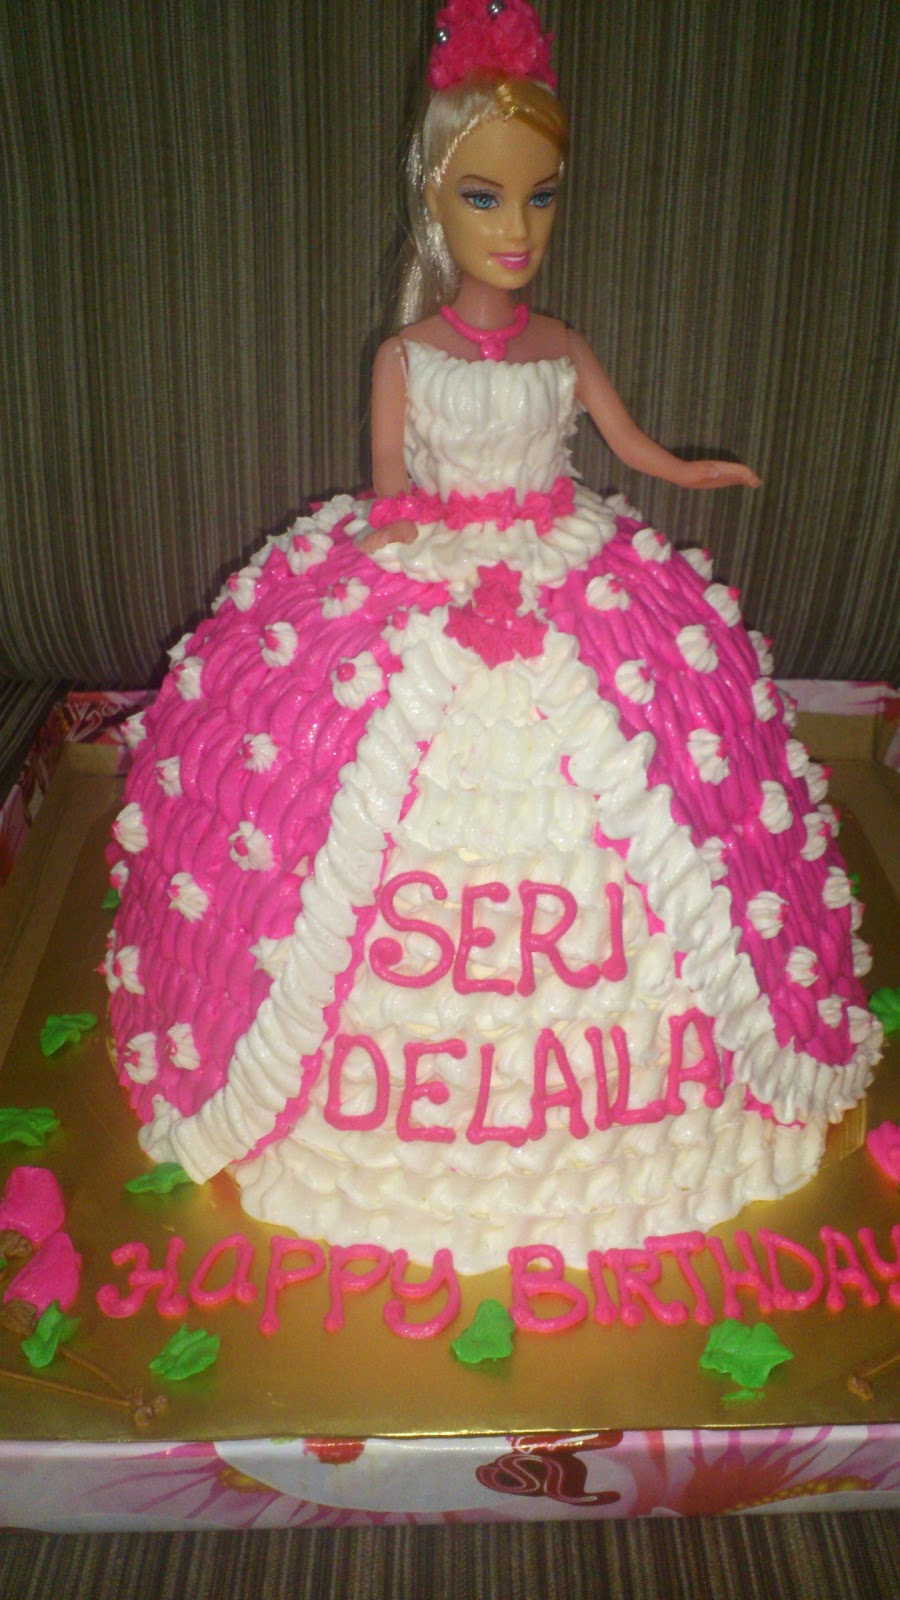 Barbie Chocolate Cake Images : emma cake & cupcakes: SEPT ORDER : BARBIE CHOCOLATE CAKE